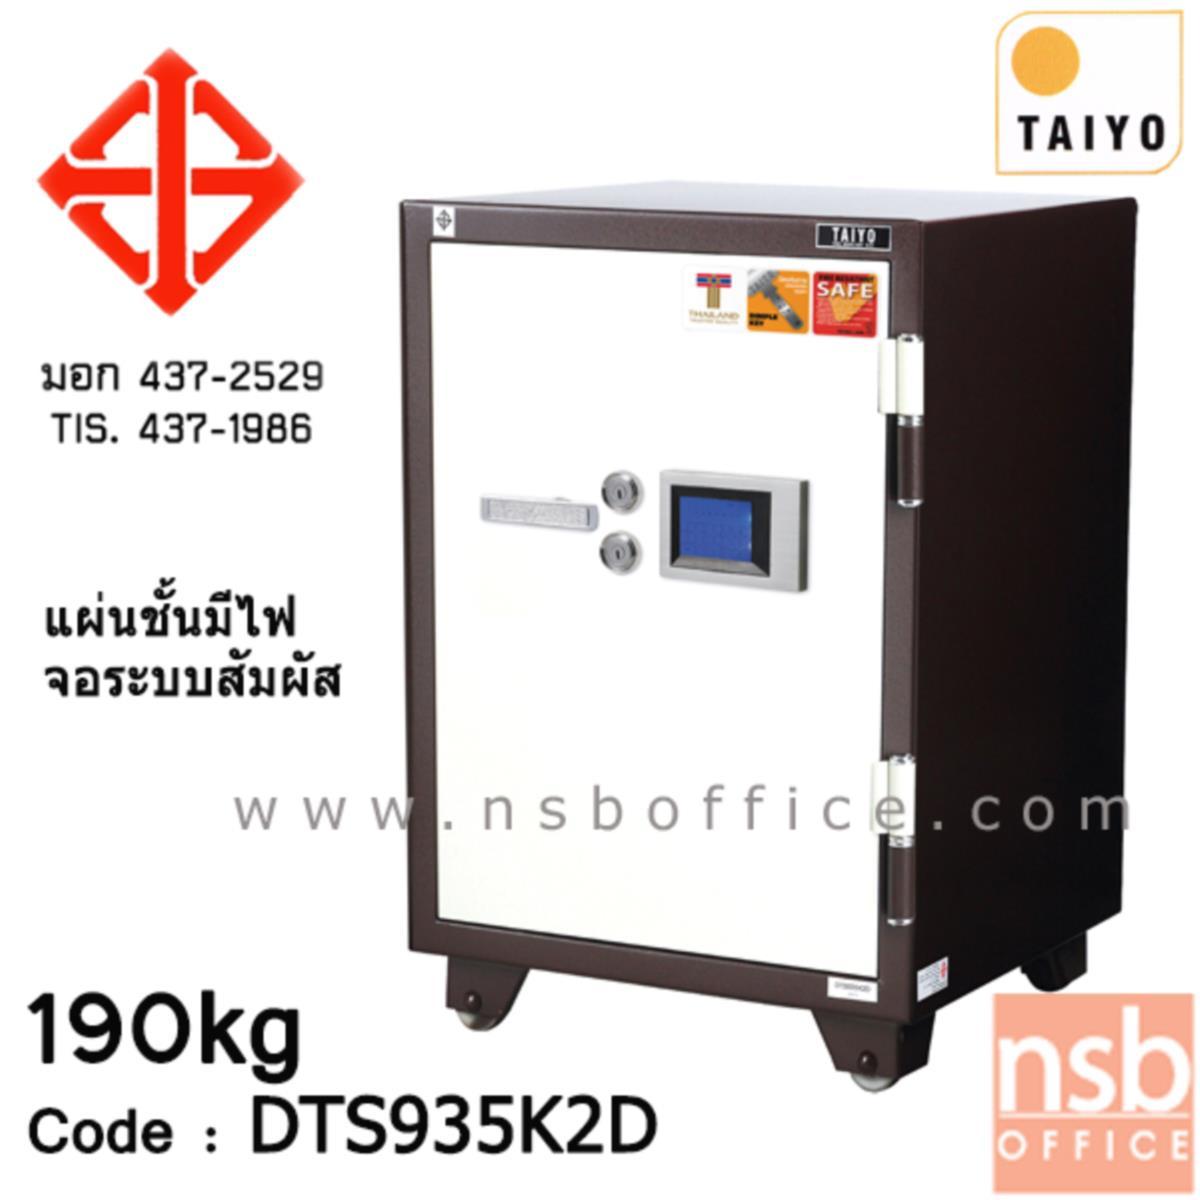 F01A060:ตู้เซฟ Taiyo ระบบดิจิตอล จอสัมผัส รุ่น 190 กก. 2 กุญแจ 1 รหัส (DTS 935 K2D)